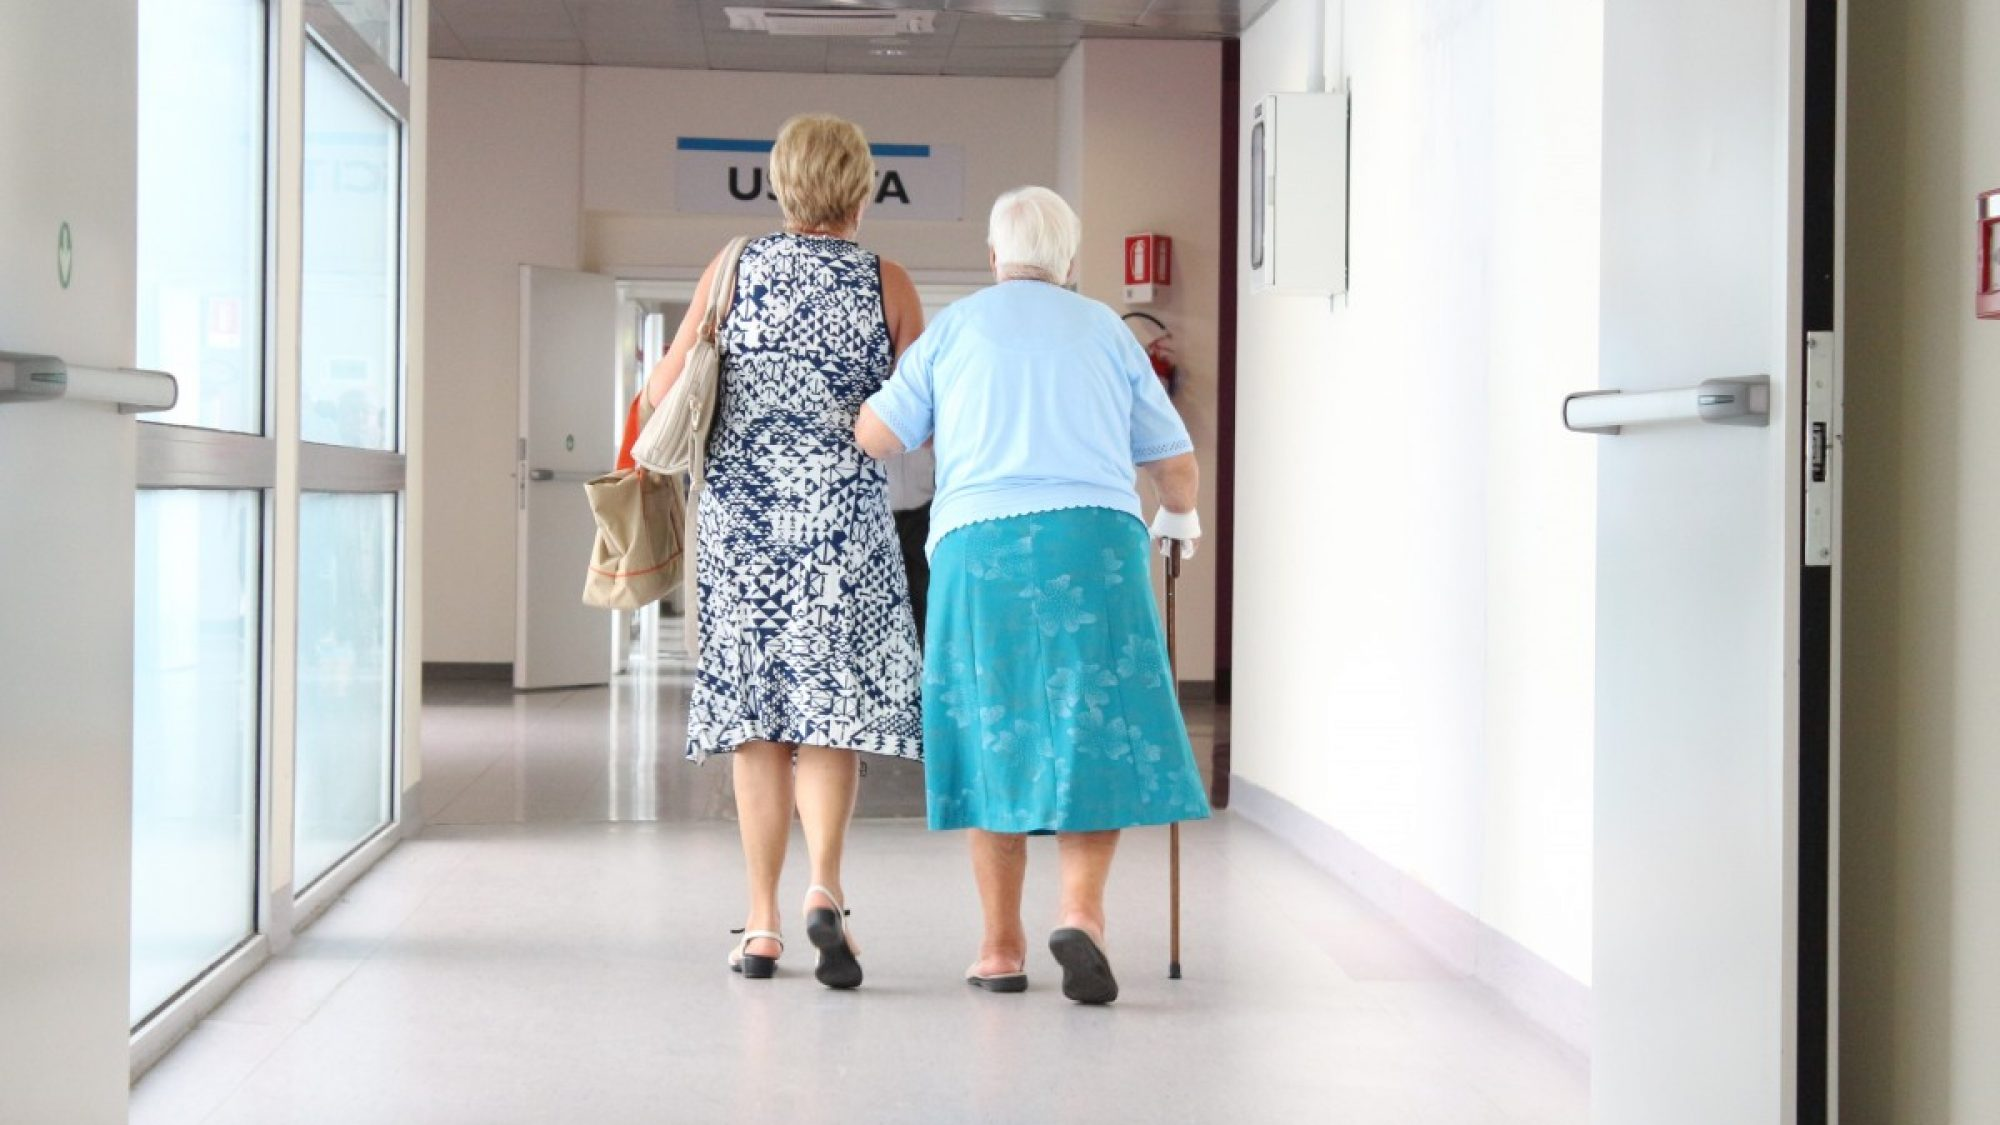 Elderly women walk down a hospital corridor